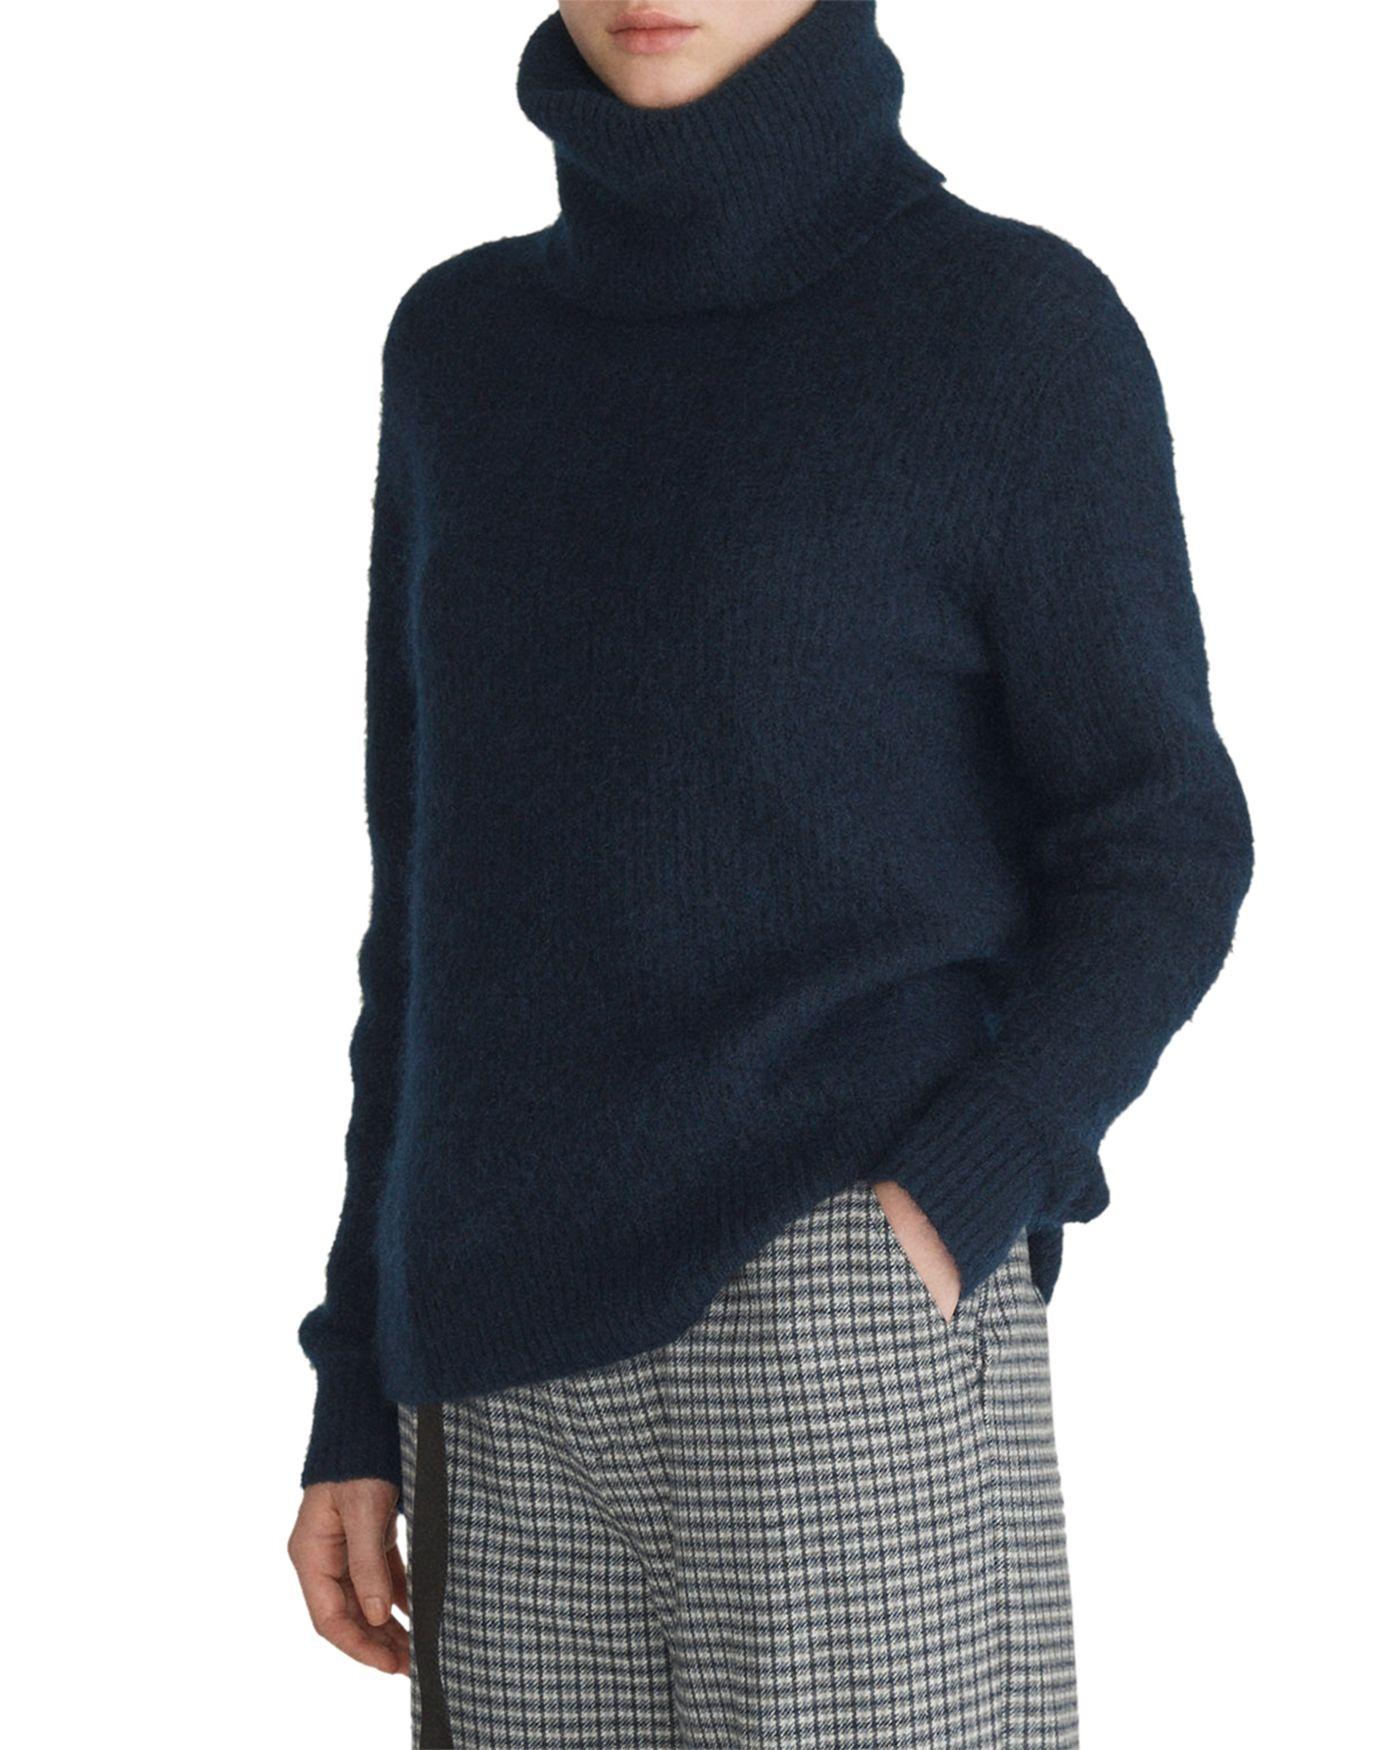 Dark Grey,100/% Alpaca soft as Pure Cashmere can be machine washed